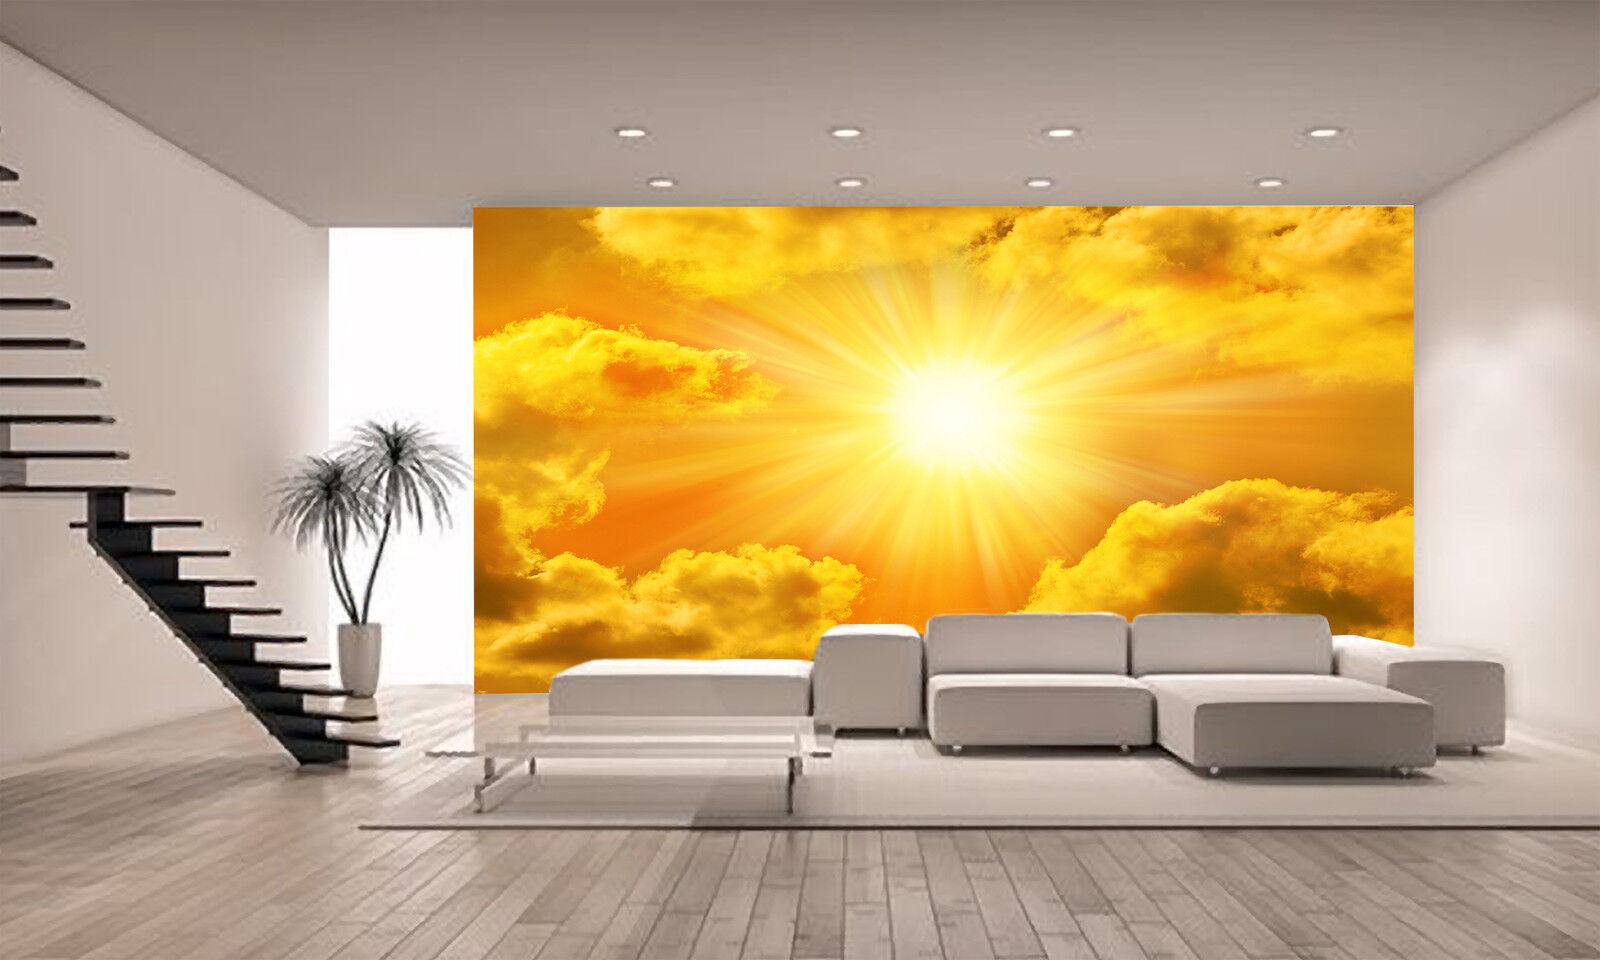 Golden Sky Sun   Wall Mural Photo Wallpaper GIANT DECOR Paper Poster Free Paste